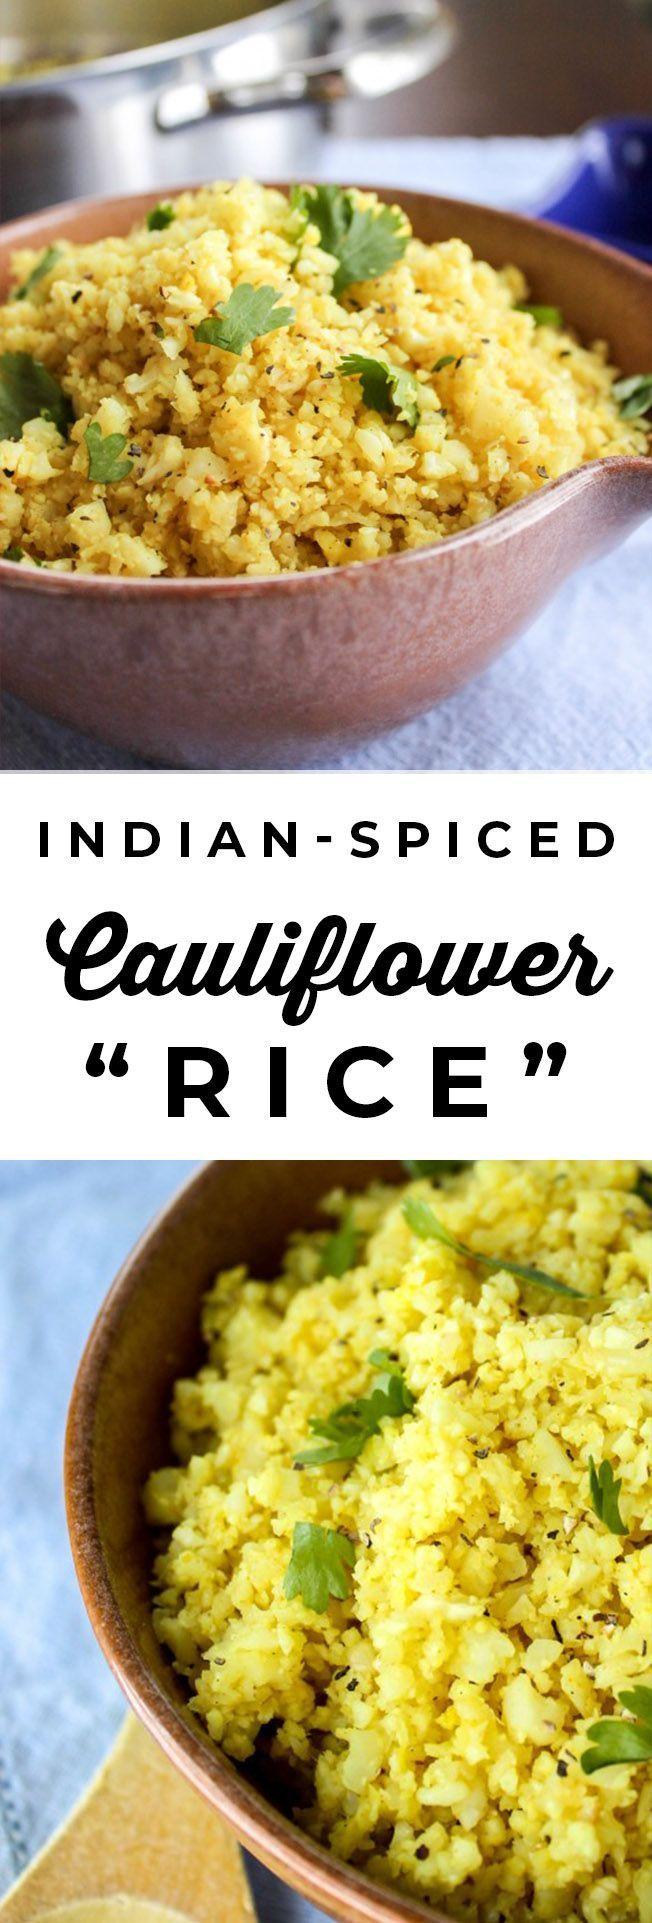 Indian-Spiced Cauliflower Rice - The Food Charlatan